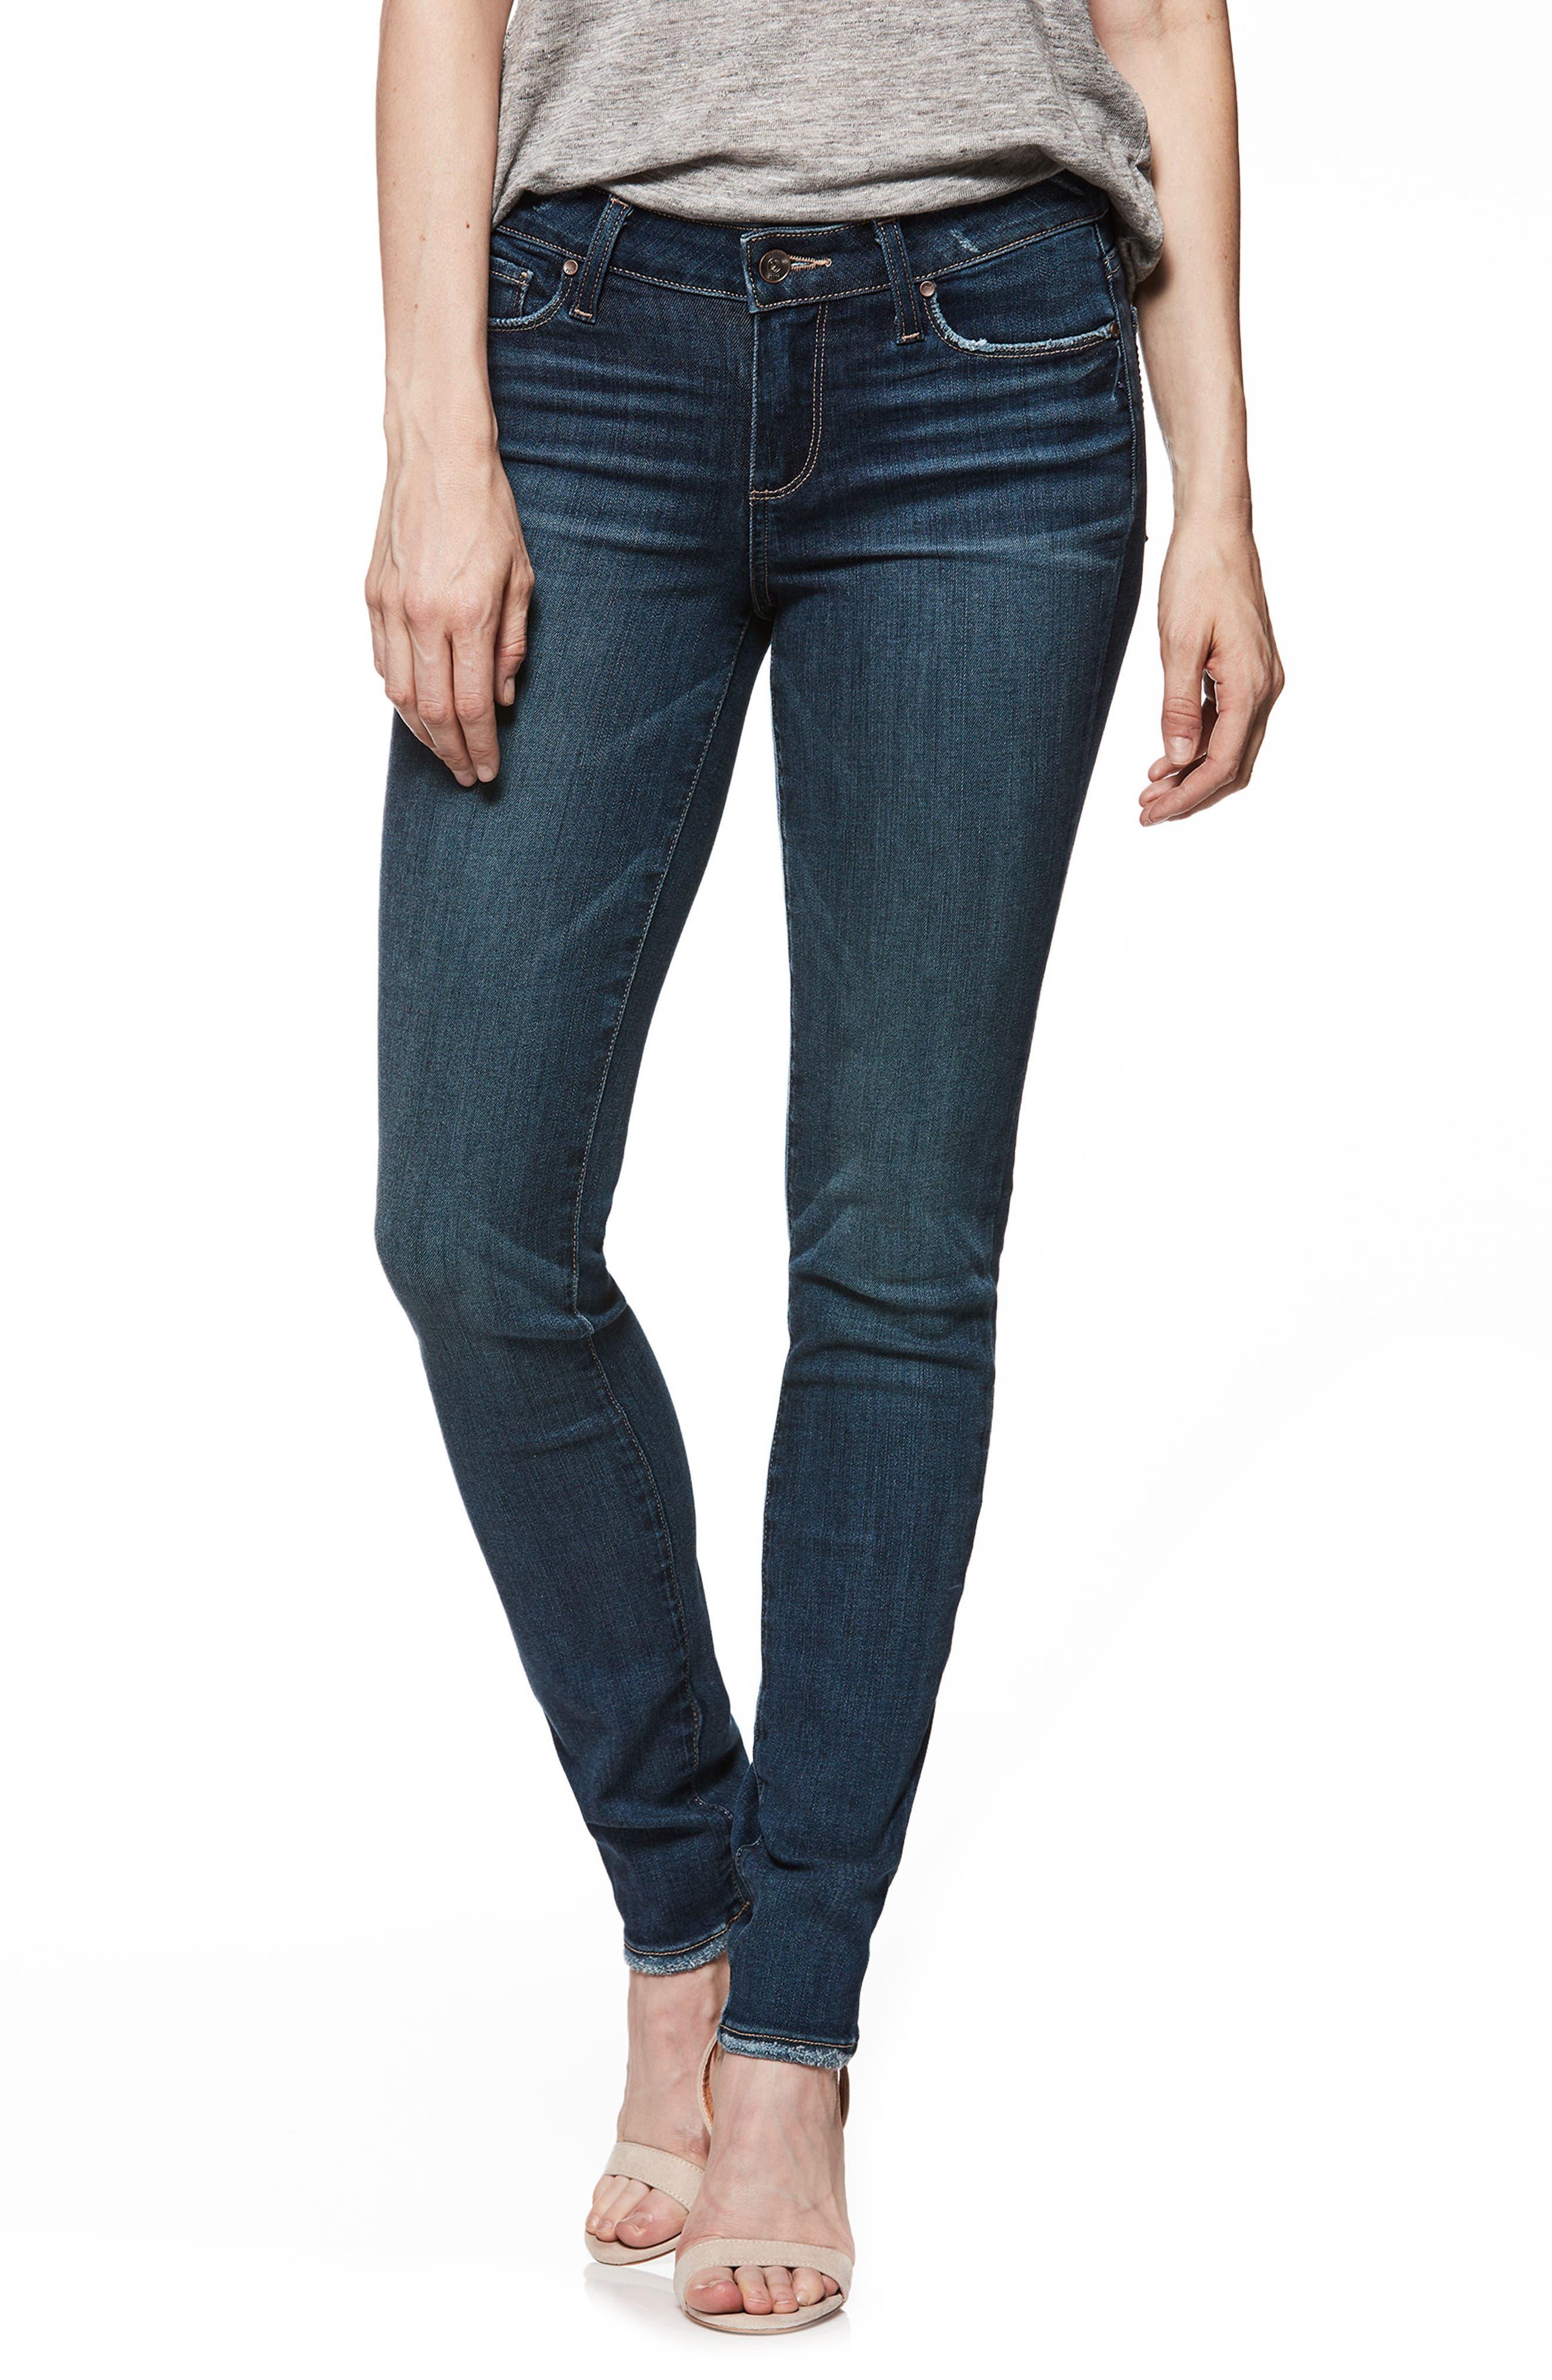 Transcend Vintage - Verdugo Ultra Skinny Jeans,                         Main,                         color, Emilio